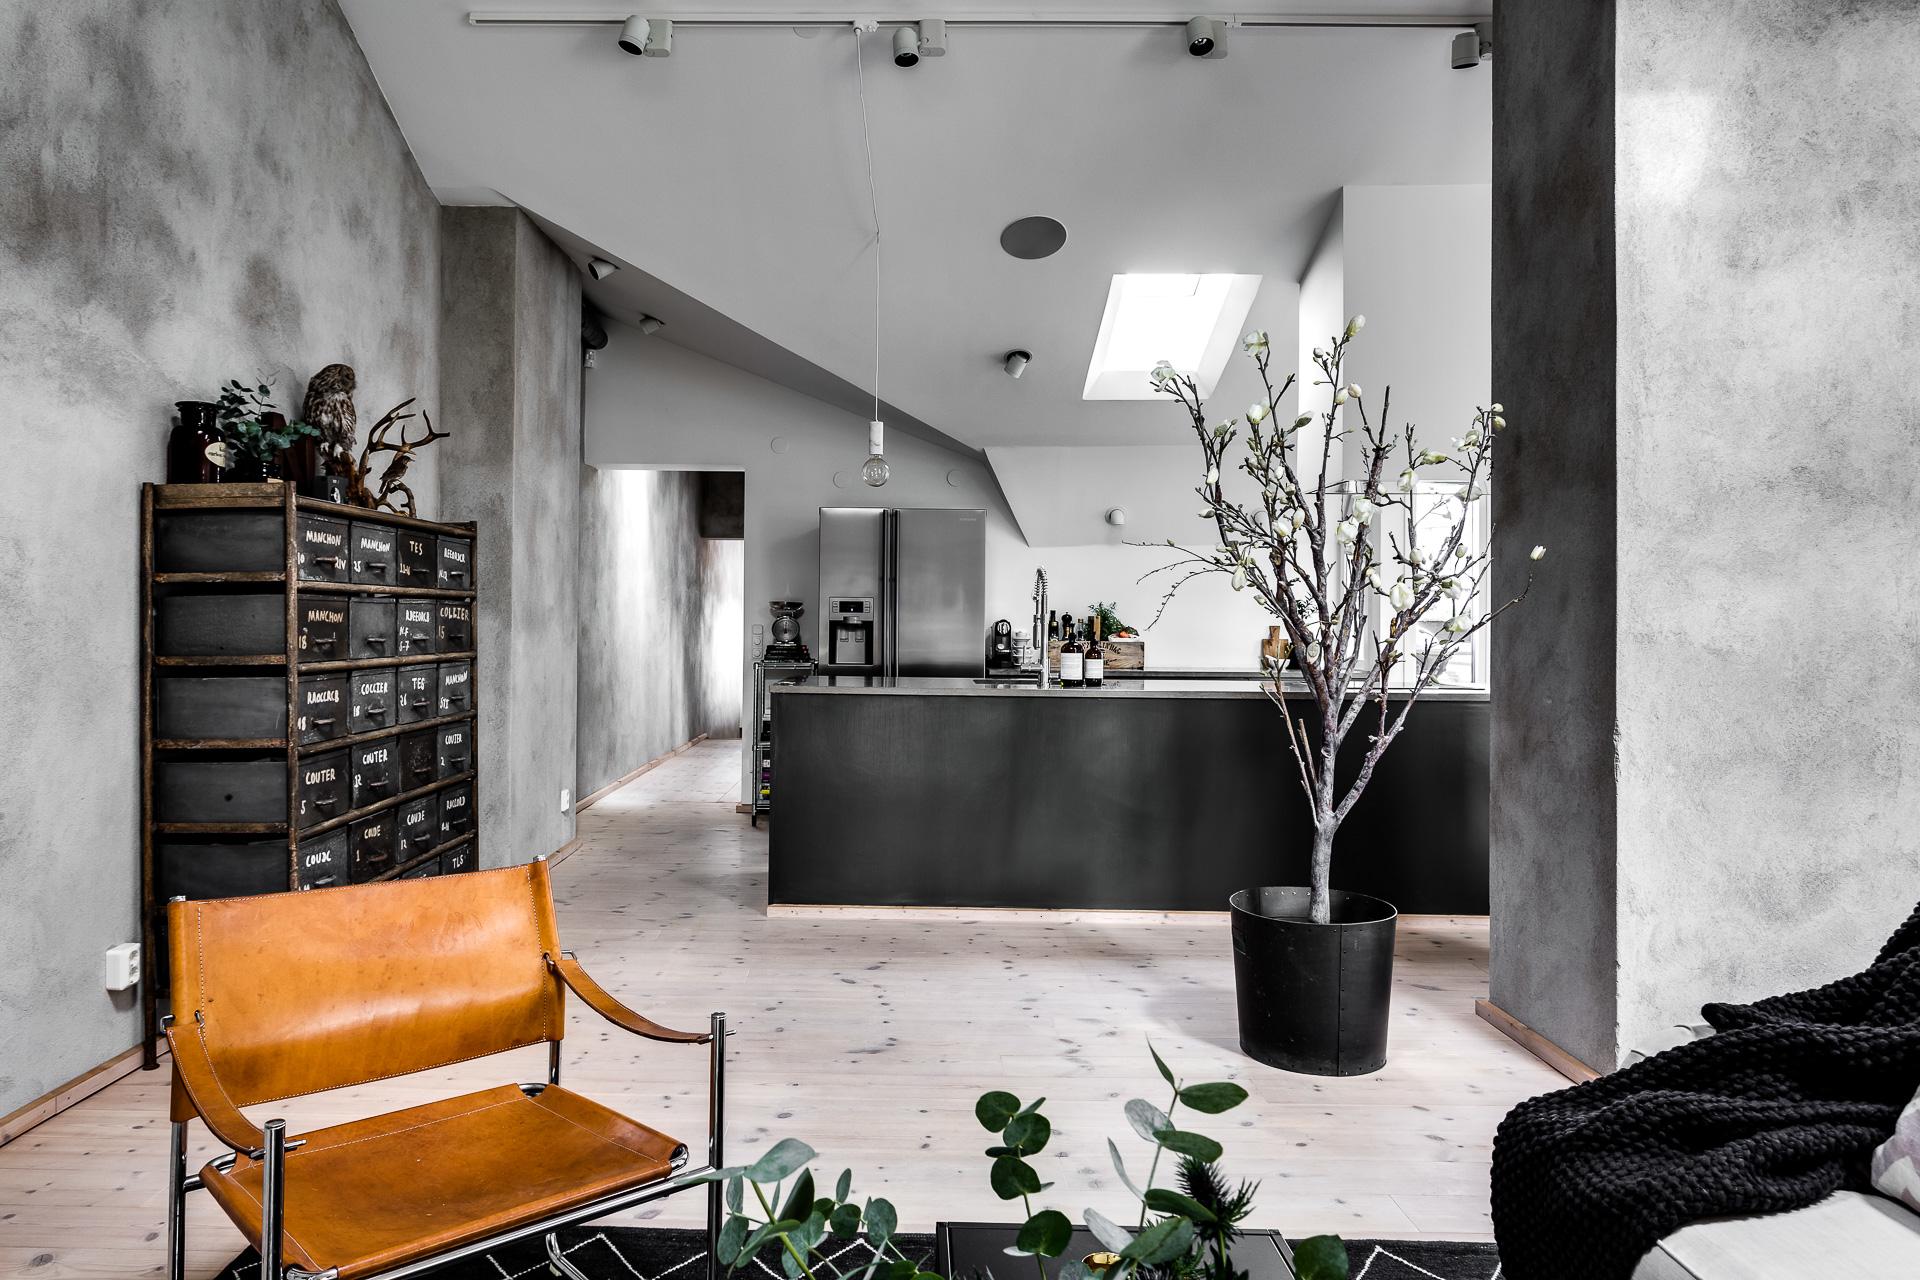 Modern Interieur Inrichten : Industriele accessoires in een modern interieur latest uw